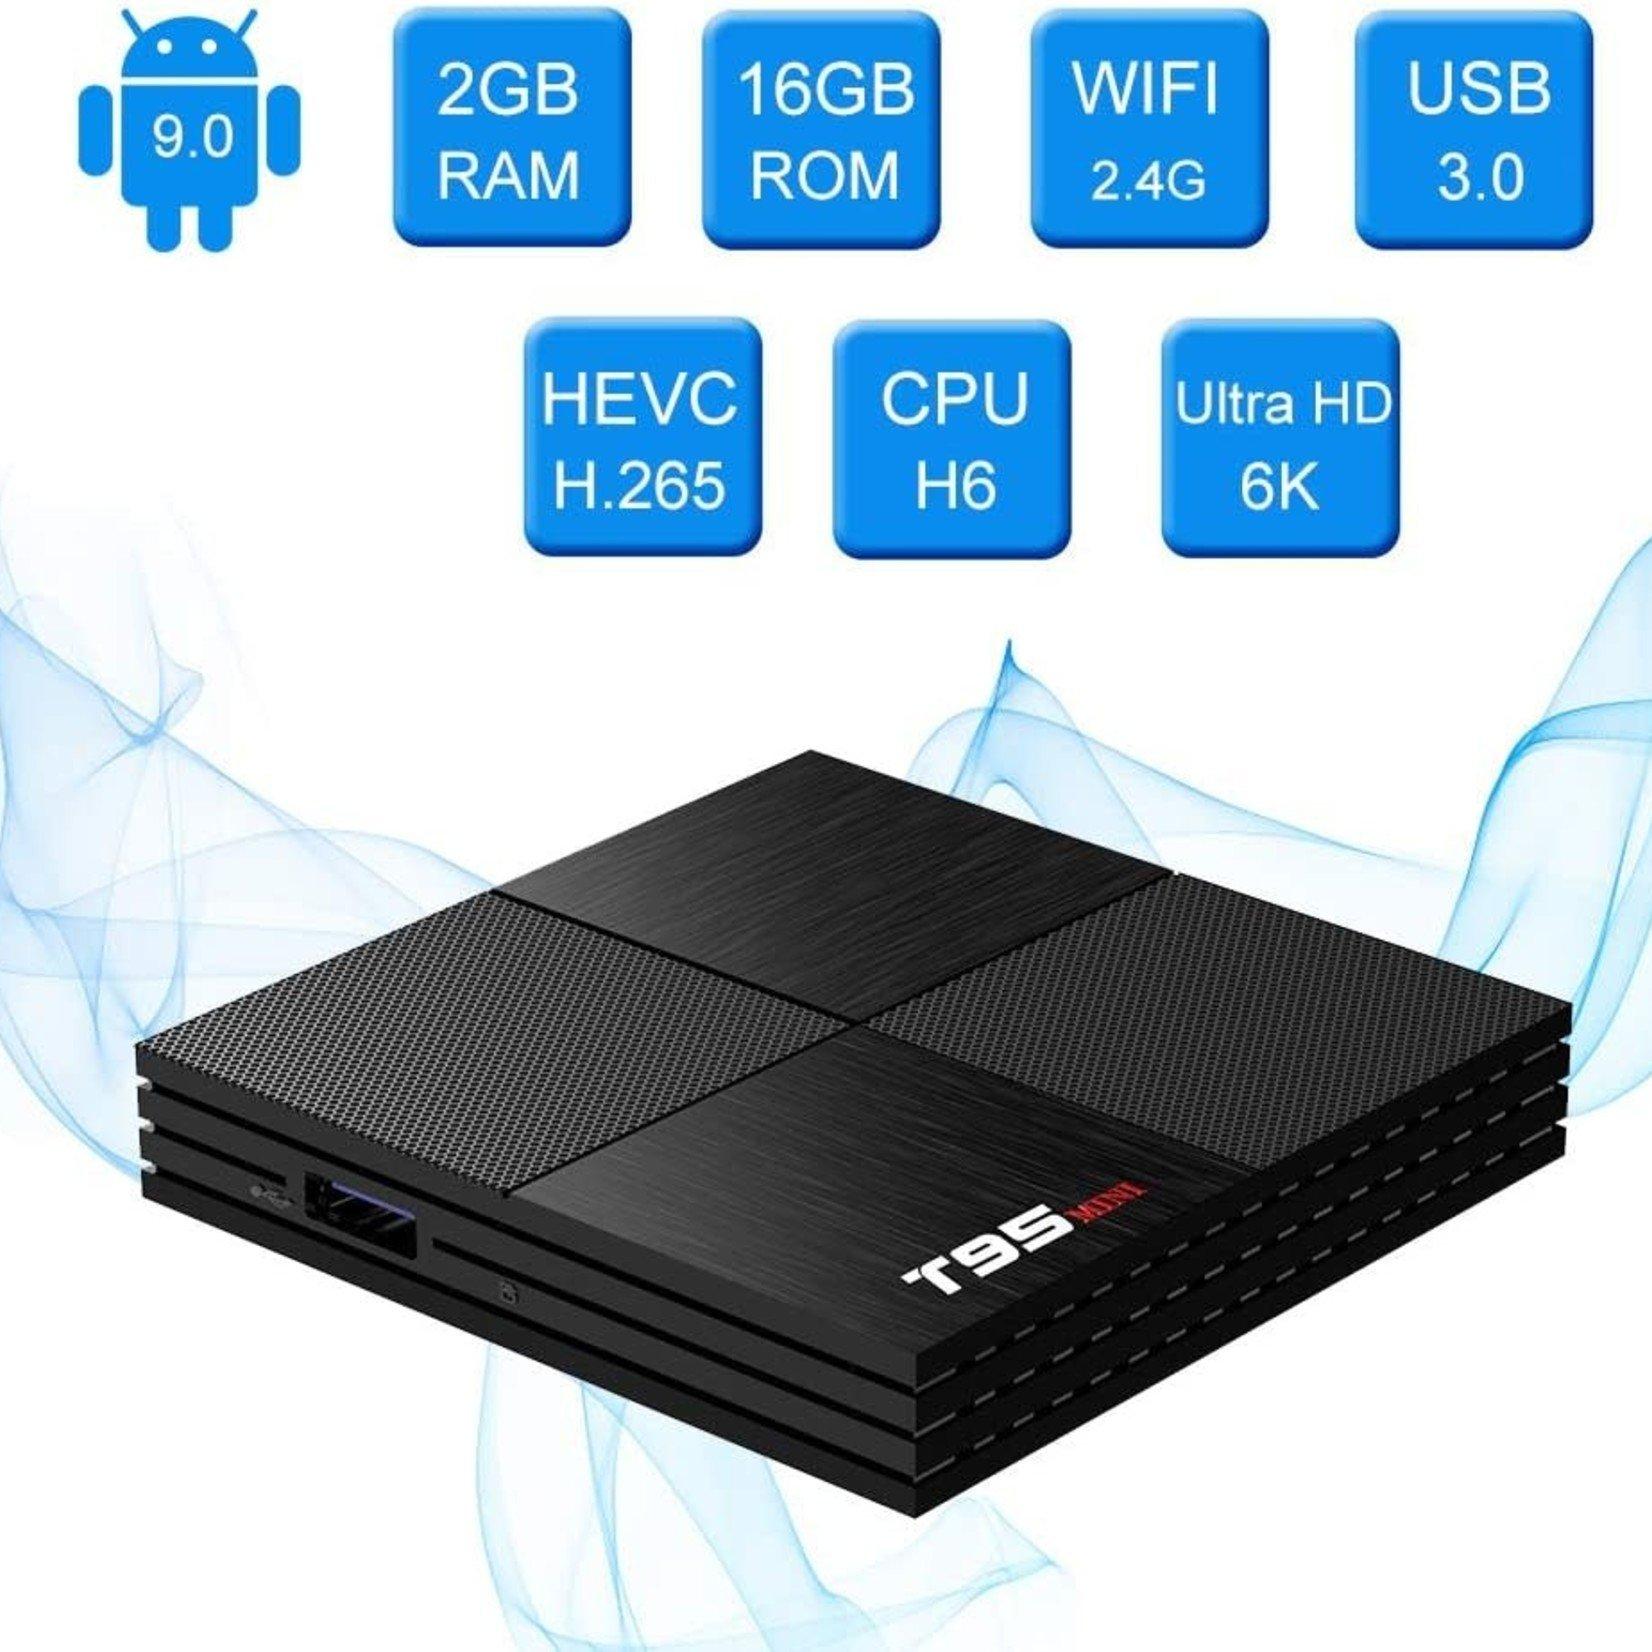 Android 9.0 TV Box T95 Mini Android Box 2GB RAM 16GB ROM H6 Quadcore Smart TV Box 2.4GHz WiFi 3D 6K Streaming Media Player